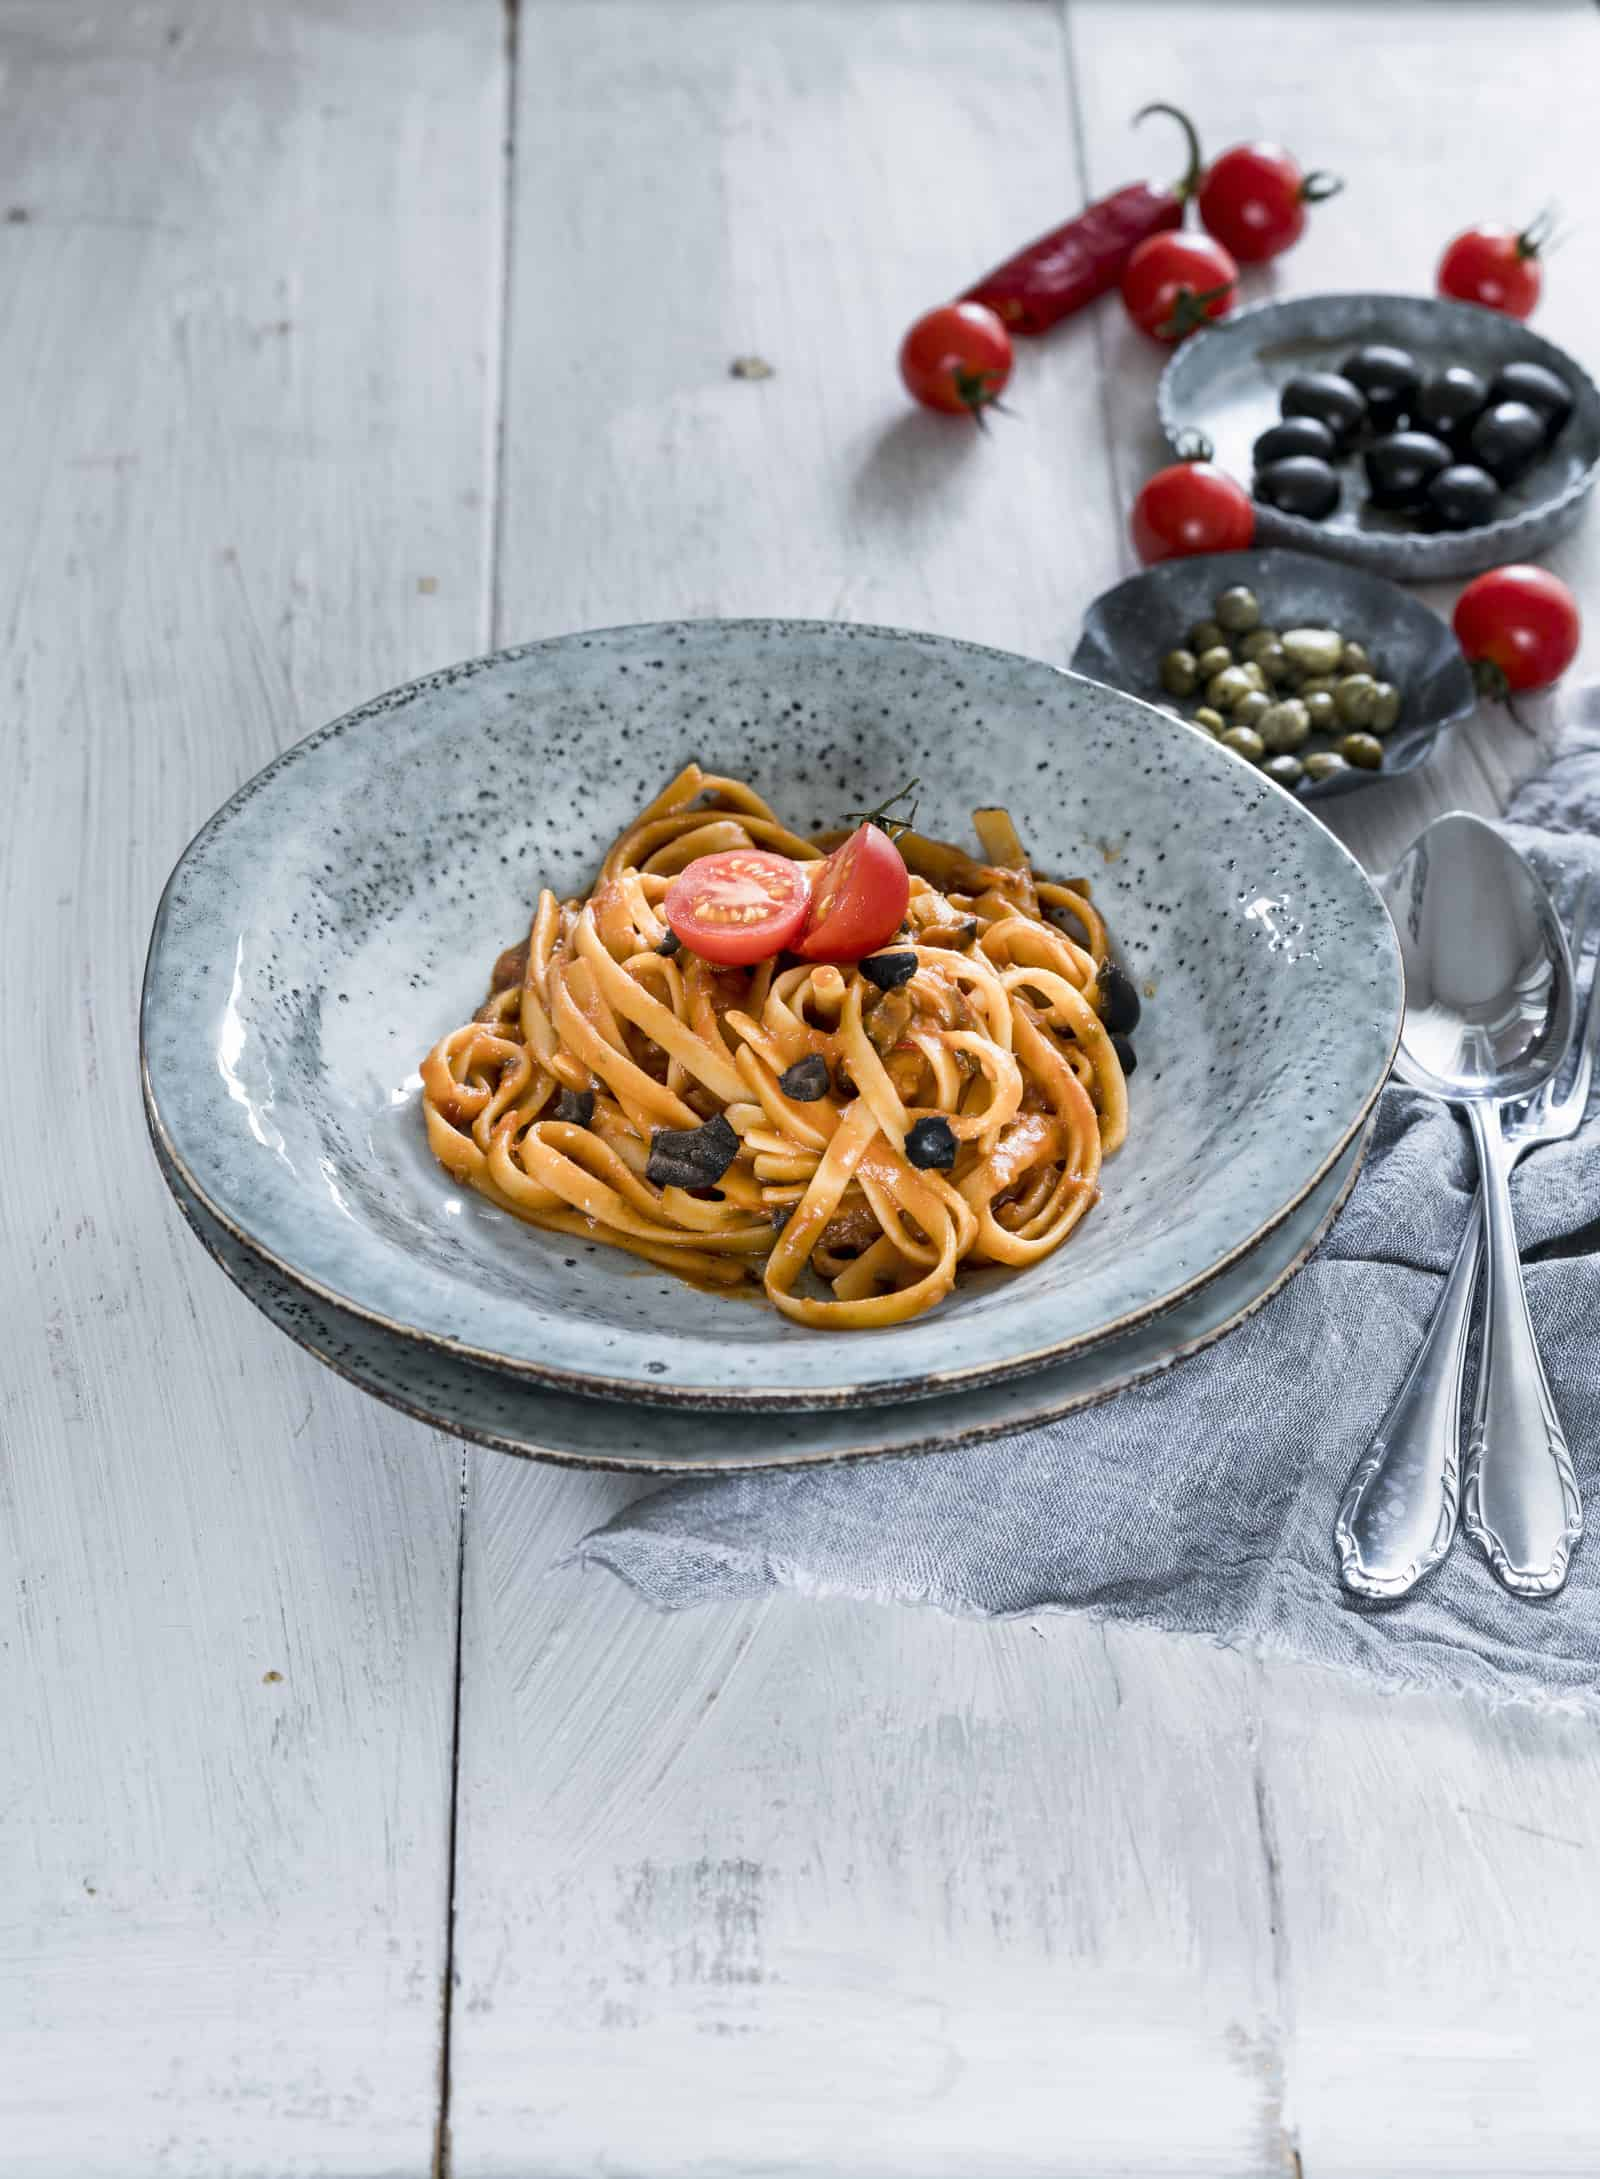 Fettuccine alla puttanesca mit dem Thermomix® –Foto: Tina Bumann